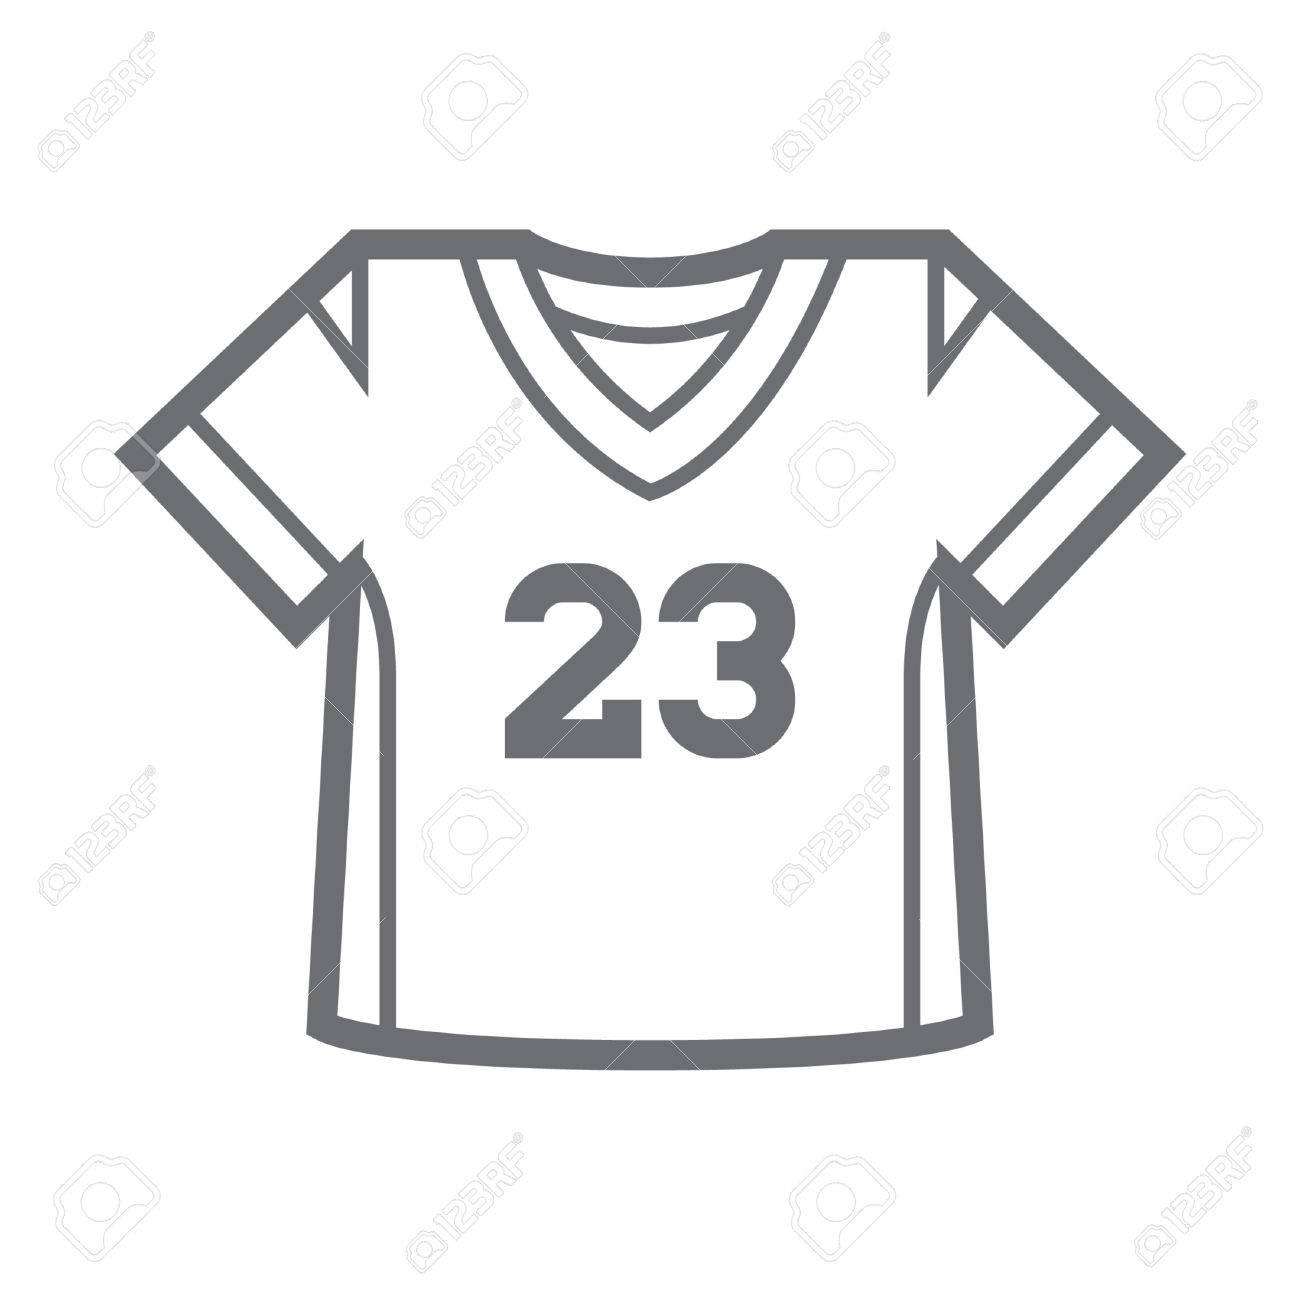 a85b0d471 american football jersey Stock Vector - 74509953